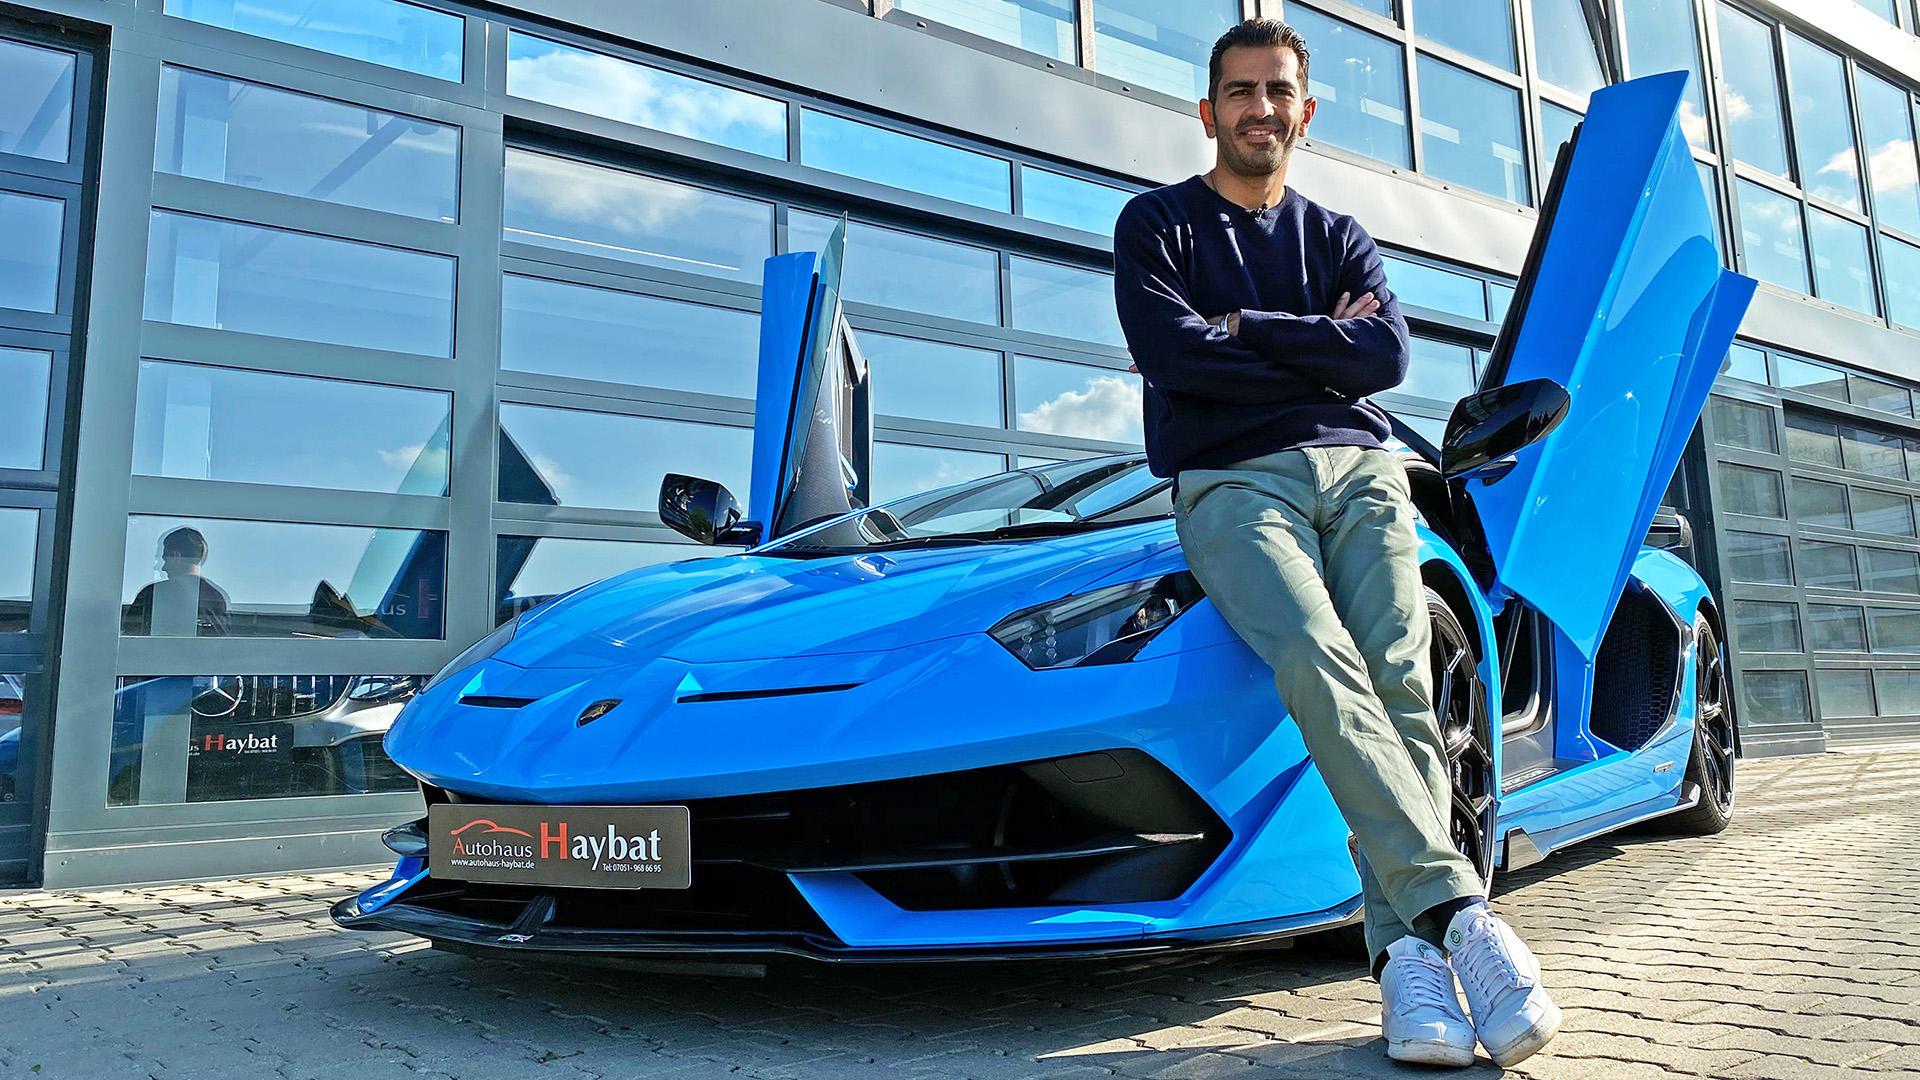 Dets Top3 Kult-Offroader | Konzeptvergleich Golf GTI vs. Golf GTE | Hamid sucht 700 PS-Sportwagen | Folge 541